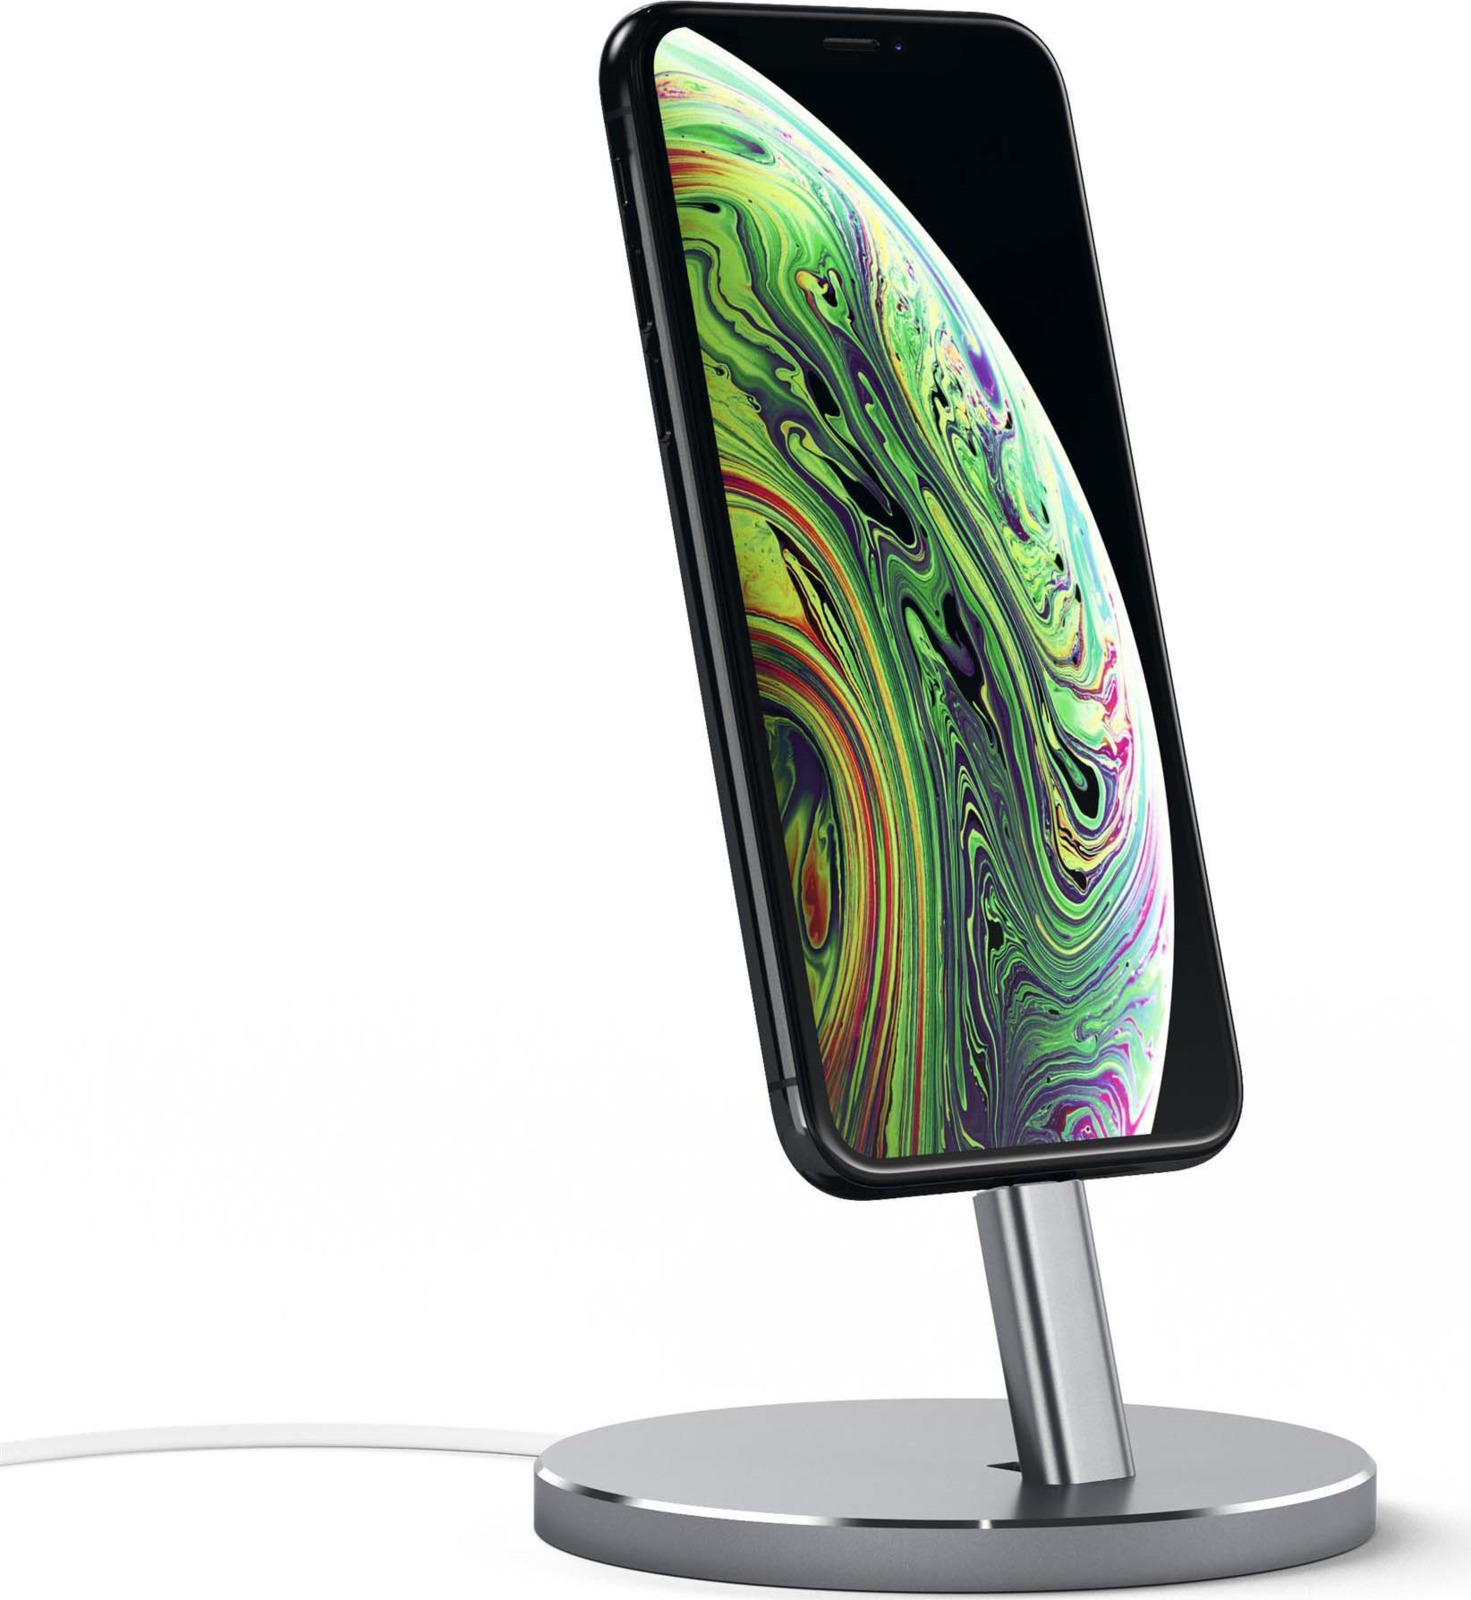 Док-станция Satechi Aluminum Desktop Charging Stand для iPhone с Lightning разъемом, ST-AIPDM, серый satechi aluminum wireless grey st ahpm